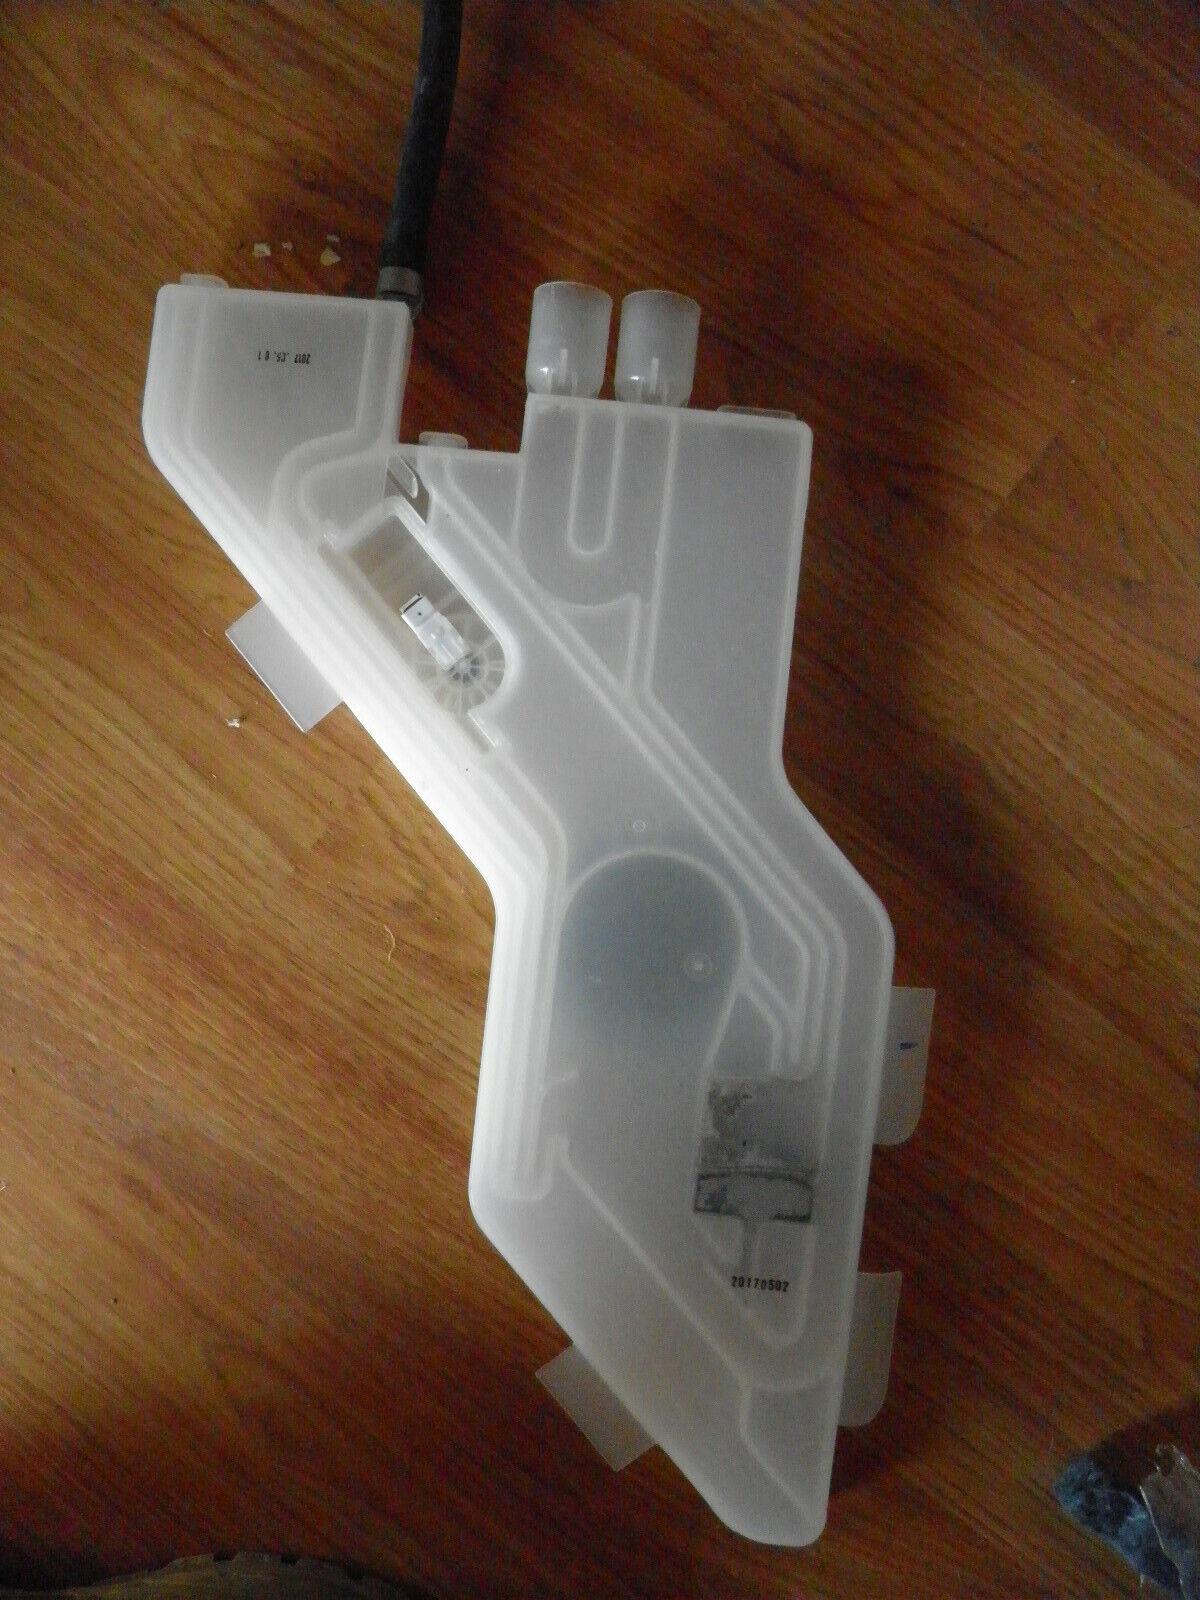 LG Dishwasher Air Assembly AEC74337401